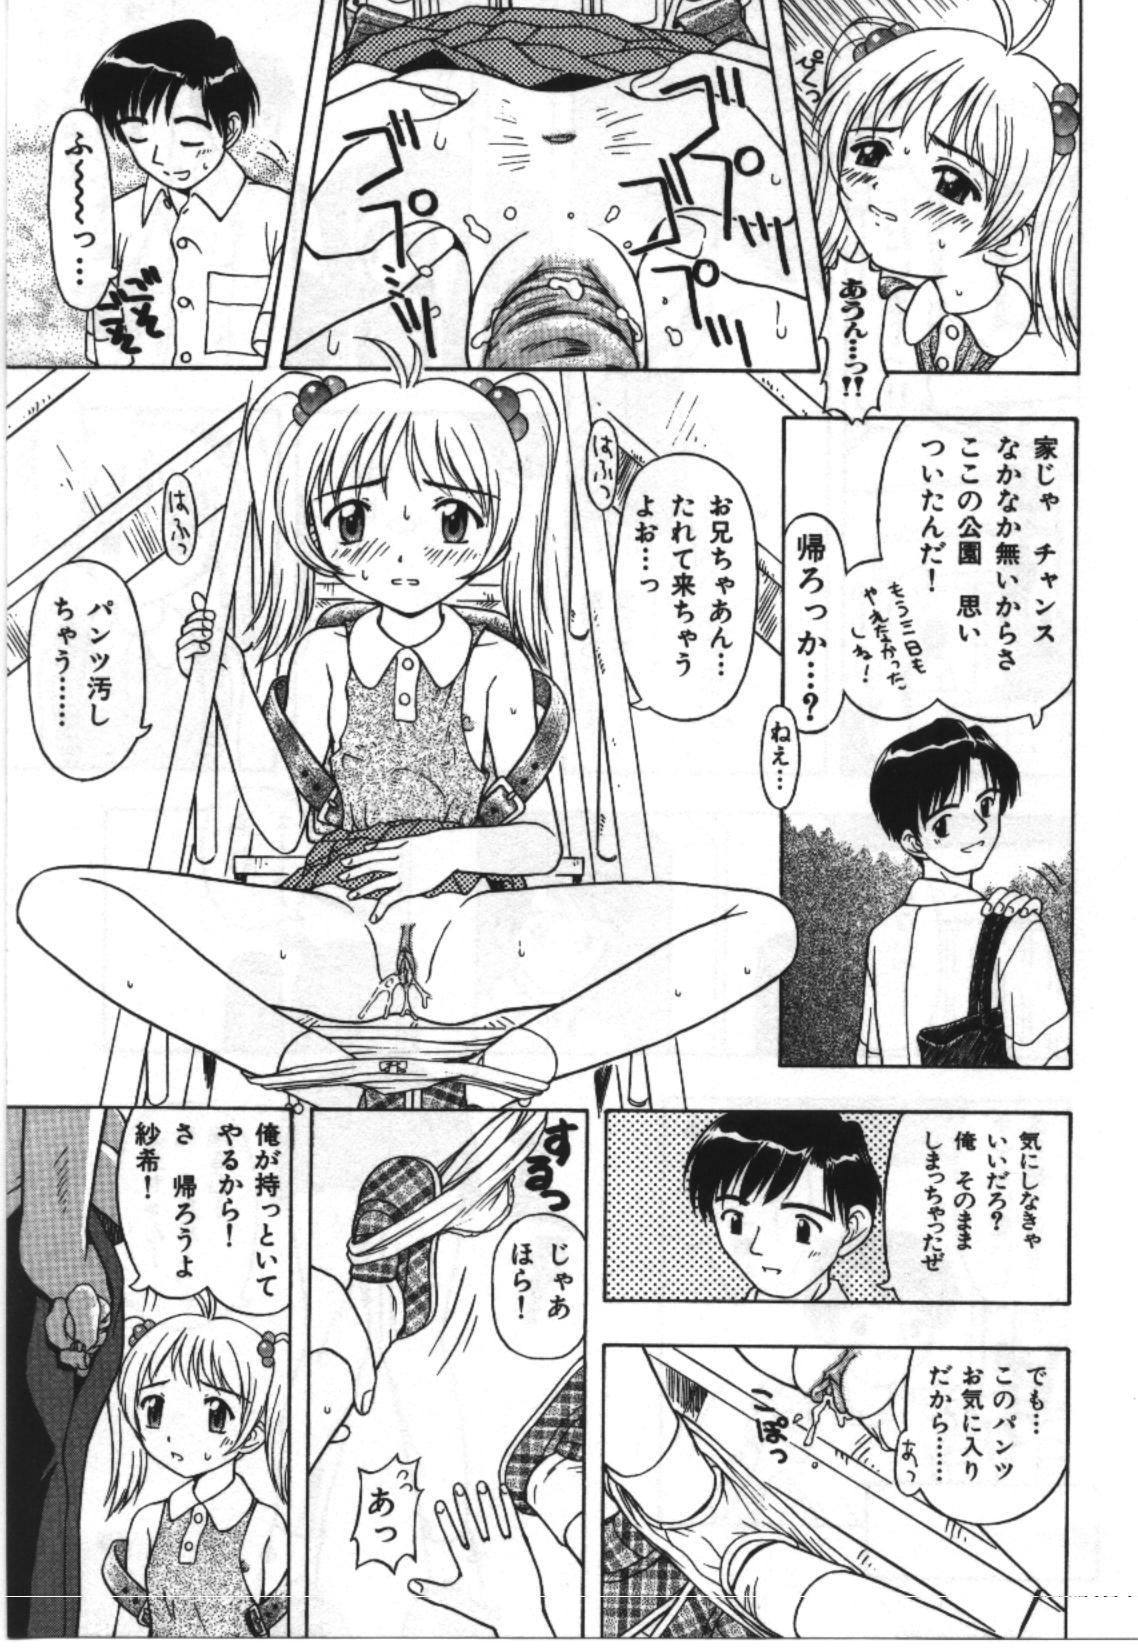 Imouto Koishi 2 56